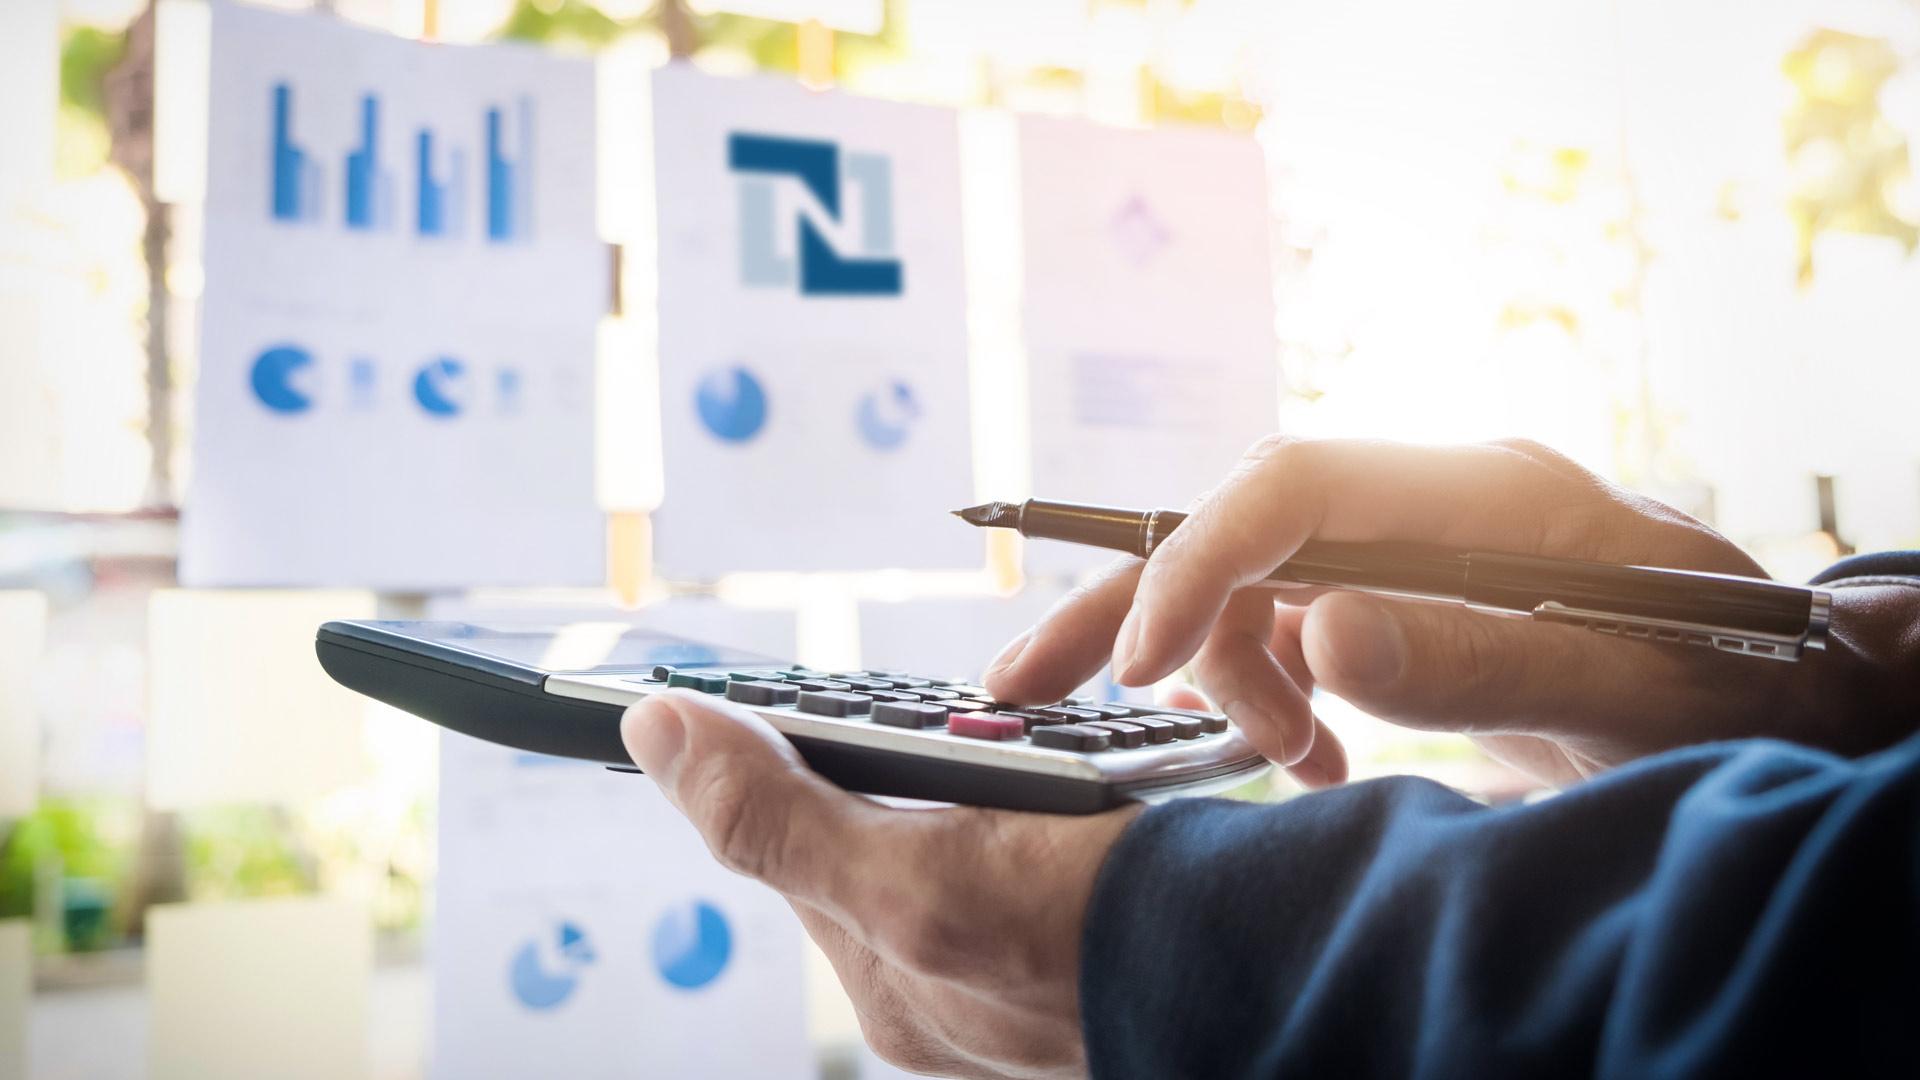 Businessman-Calculating-Invoices-Using-Calculator-netsuite.jpg